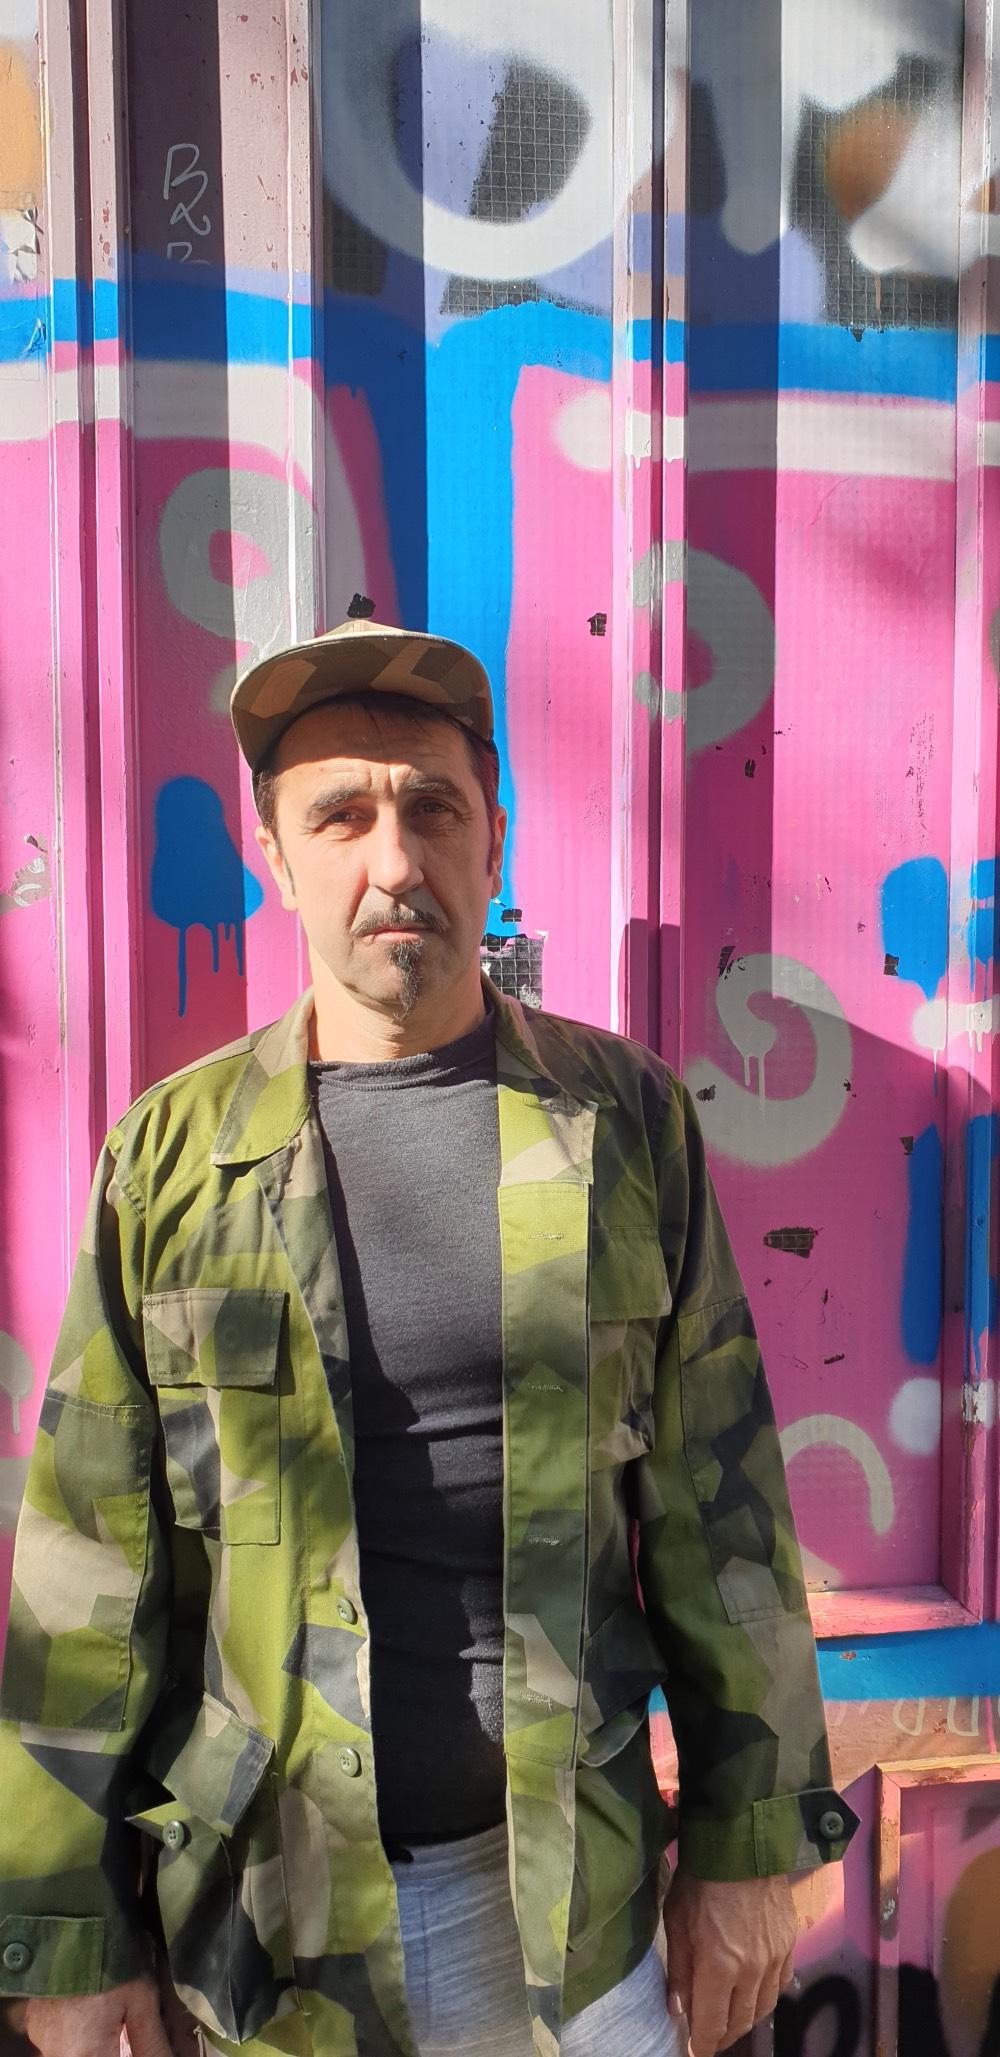 marek-schovanek-umelec-rozhovor-street-art